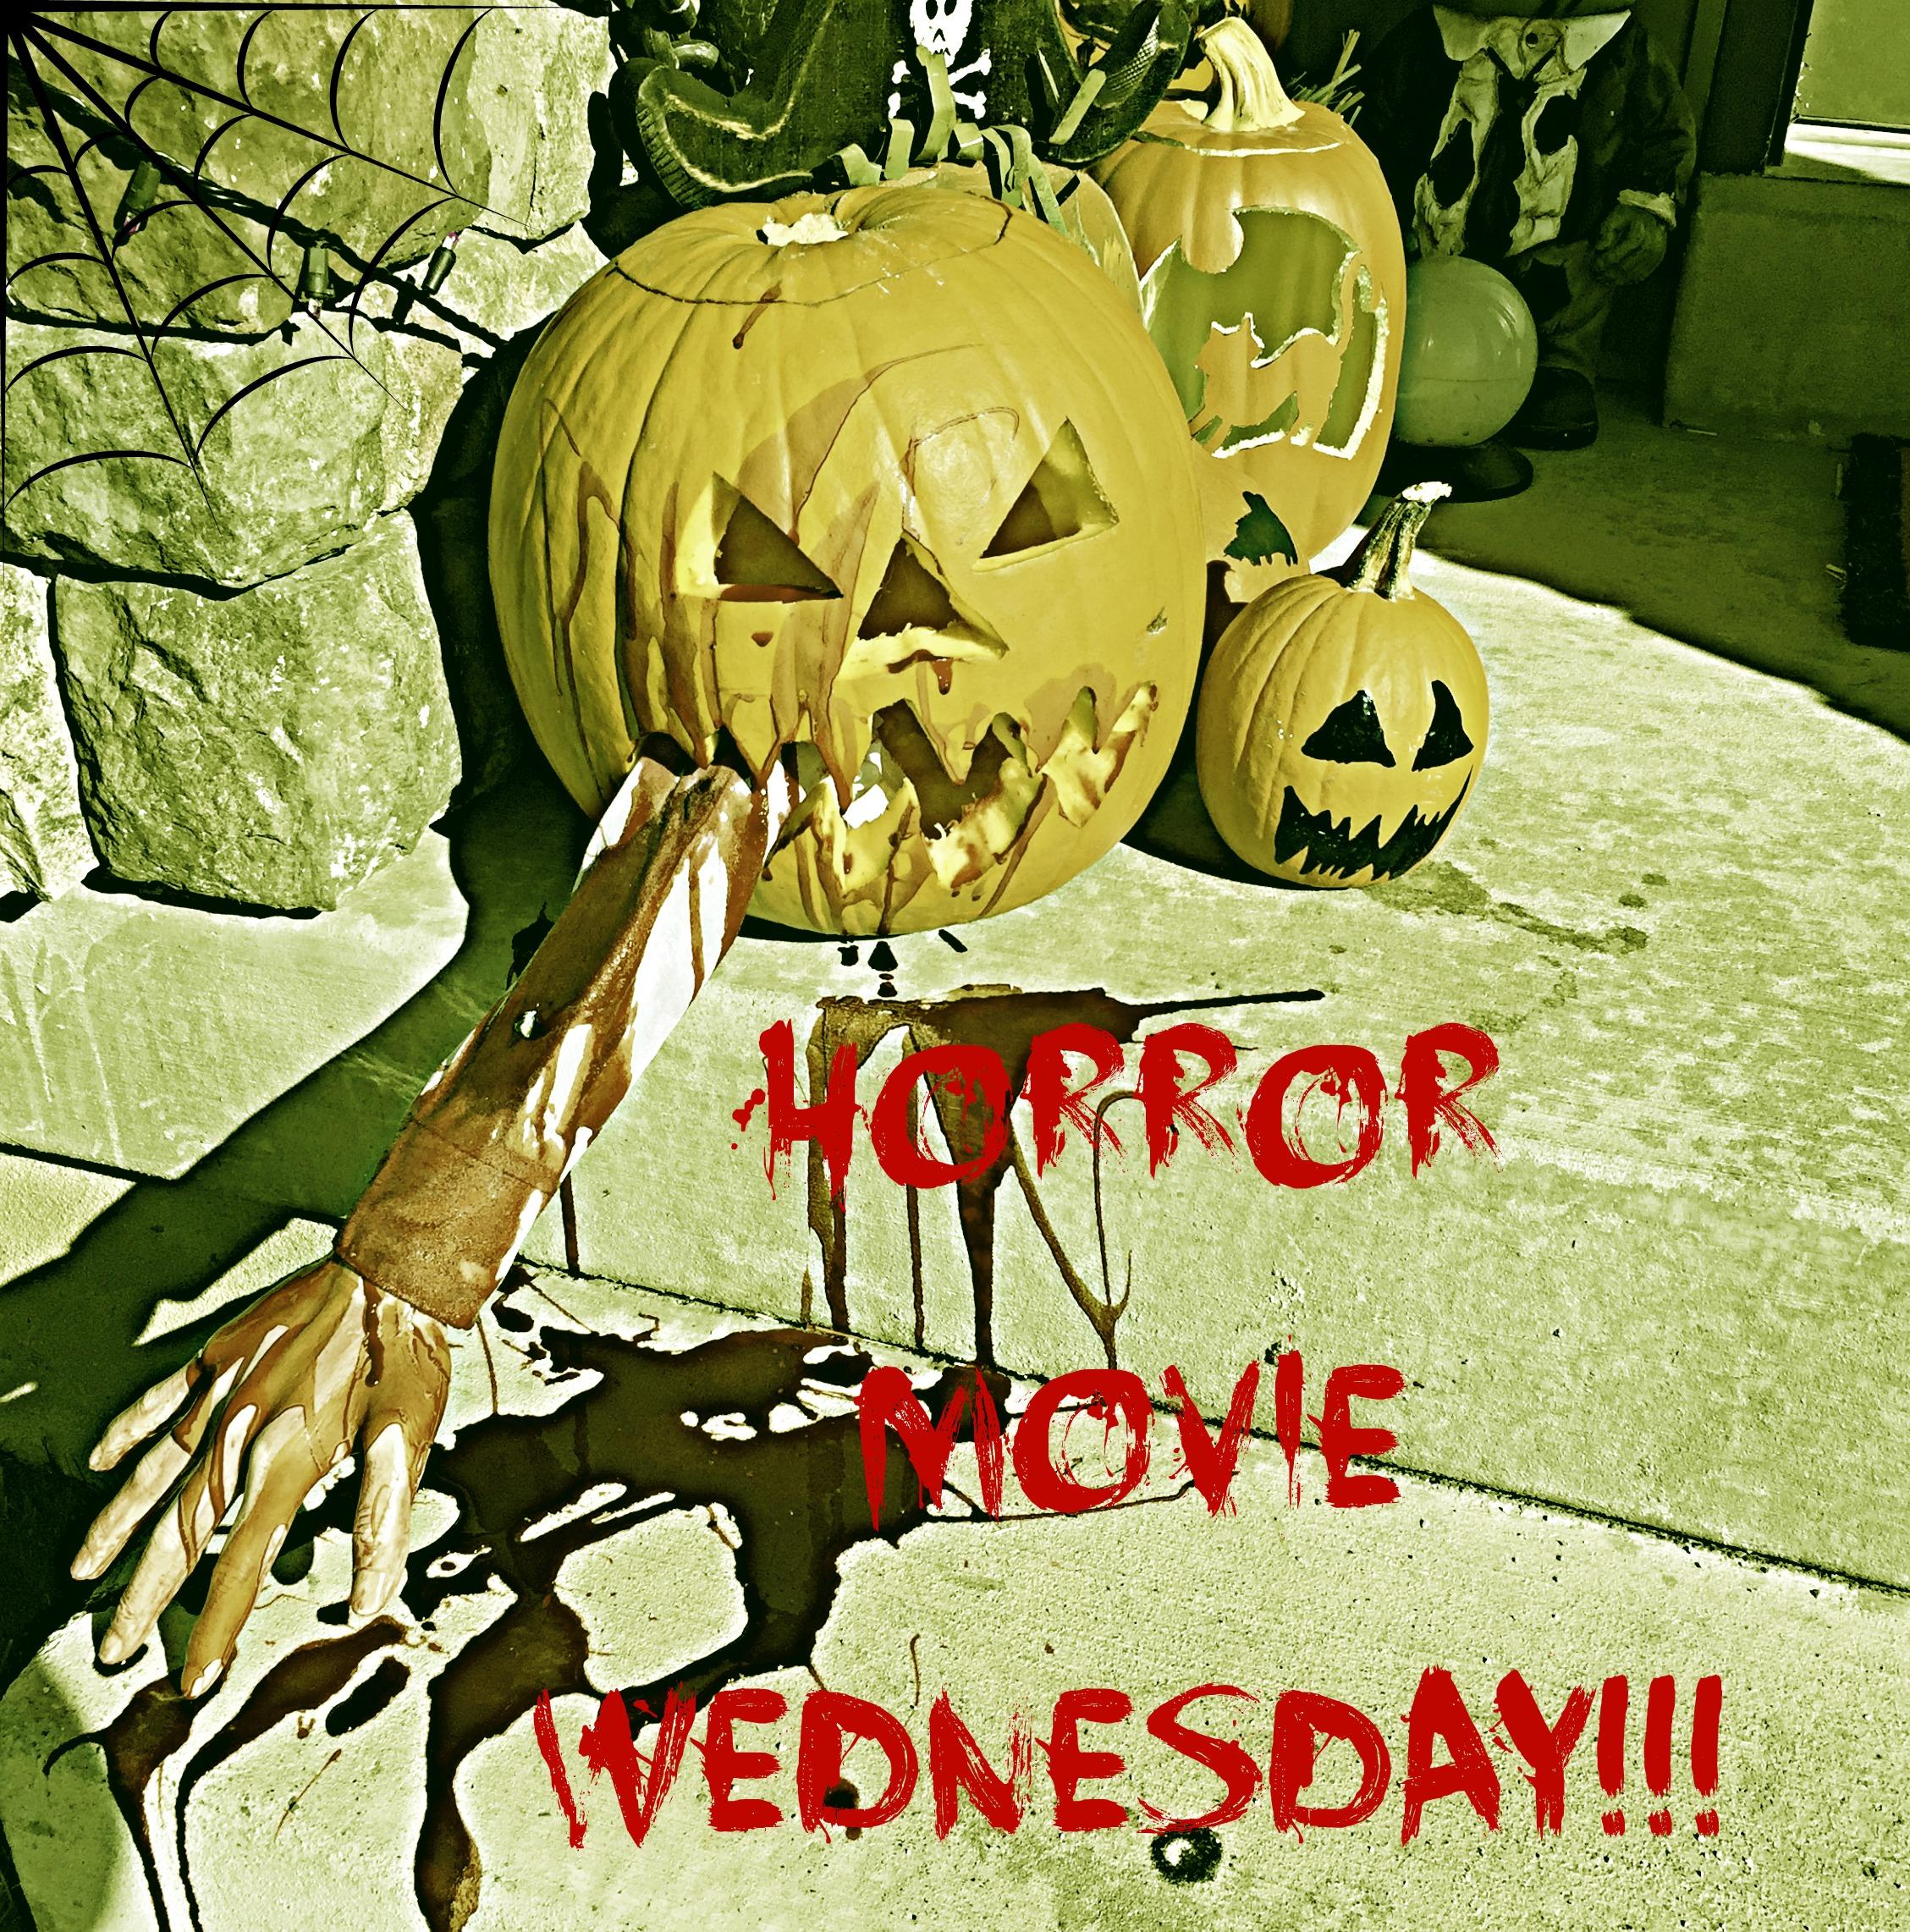 horrormoviewednesdaypic